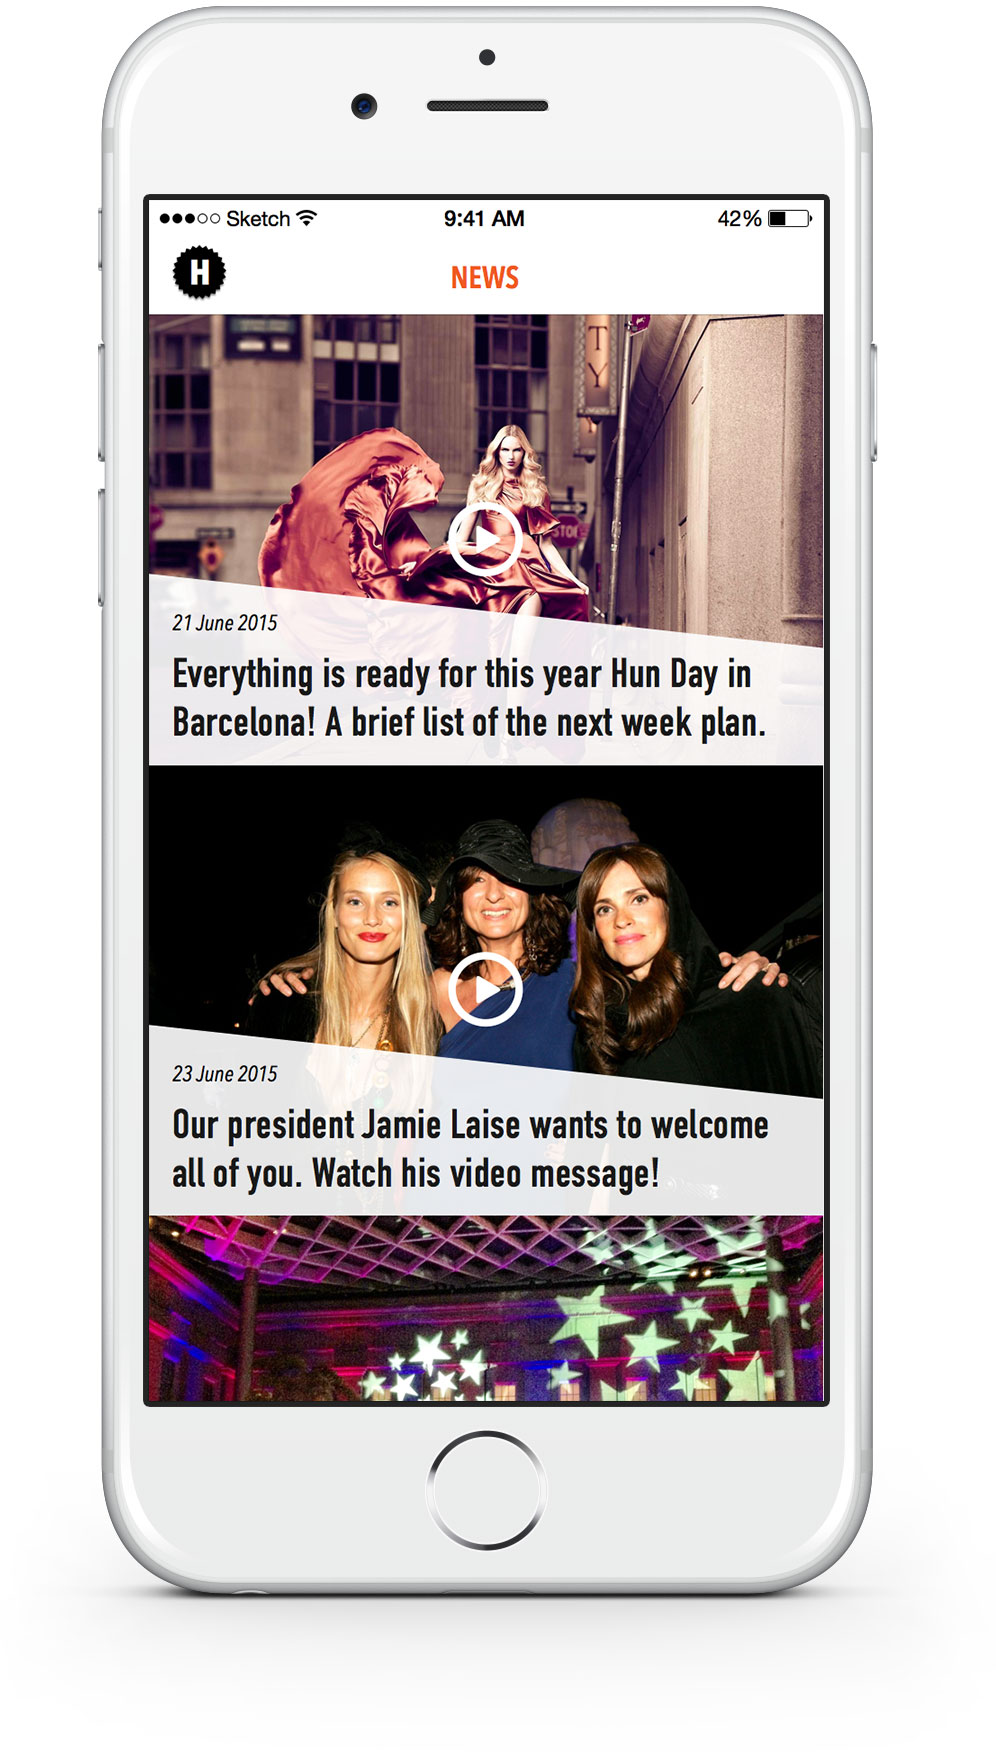 3_newsFeed.jpg